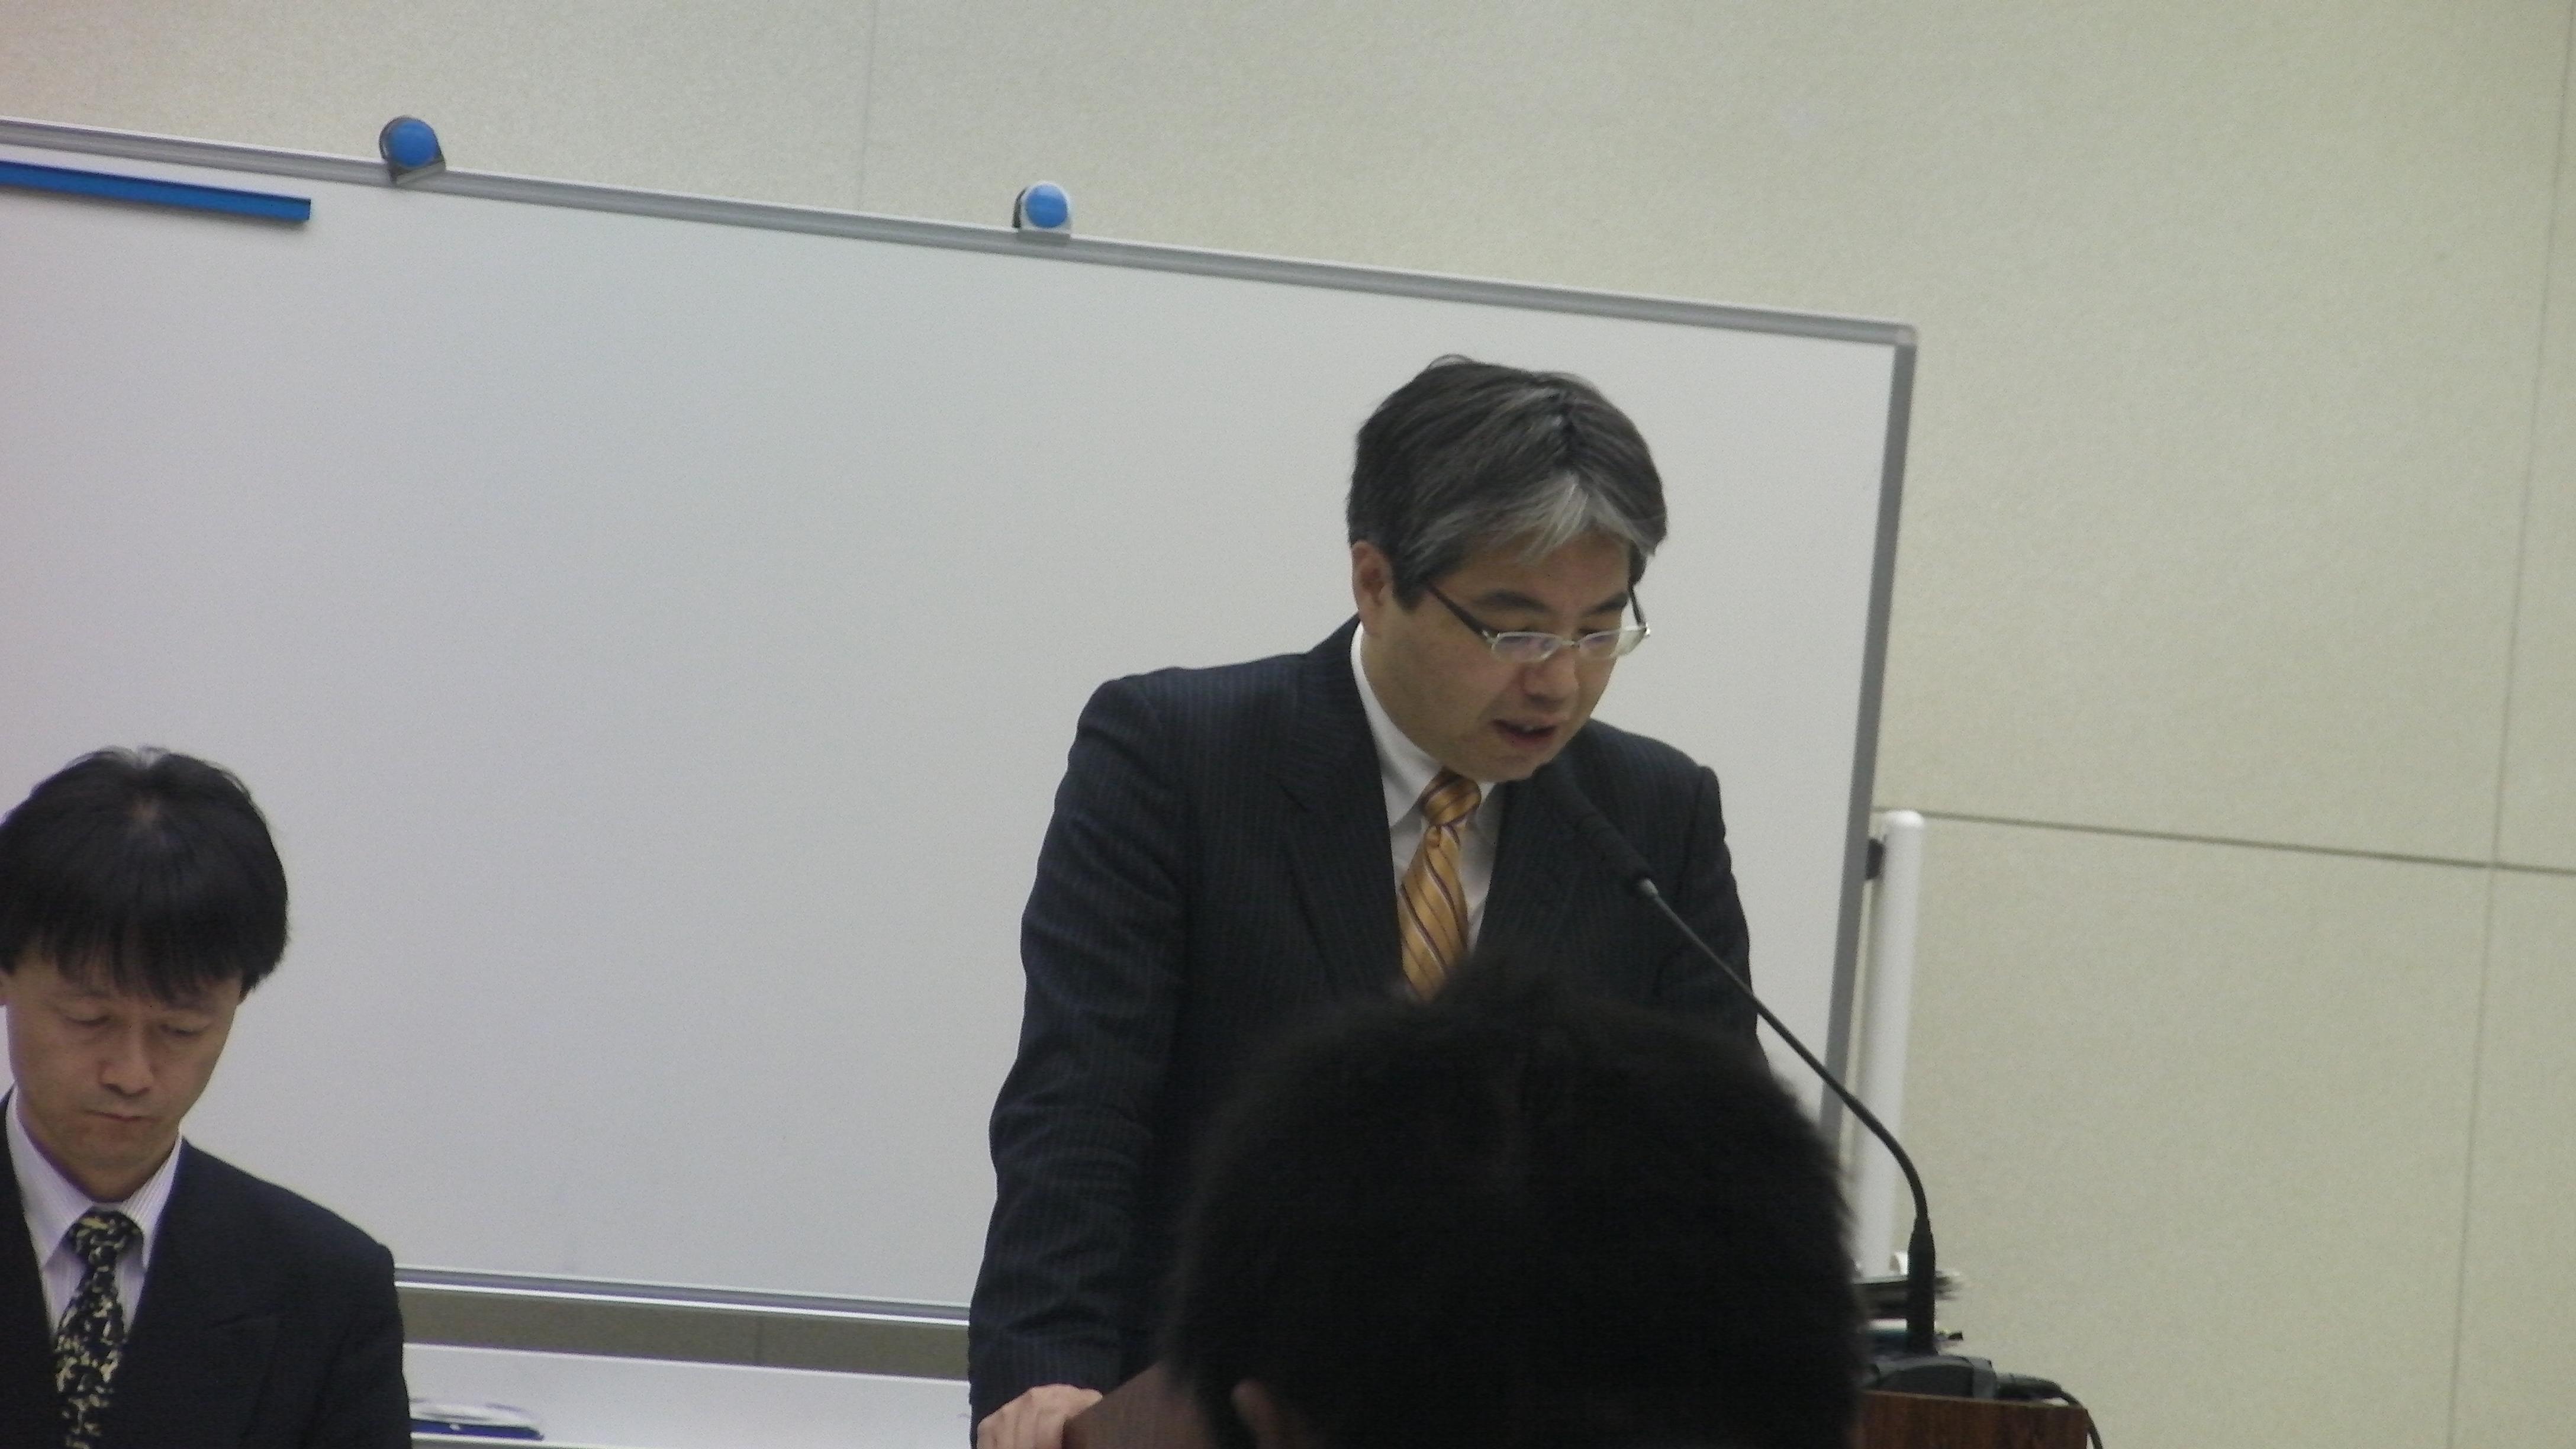 http://daily.magazine9.jp/m9/oshidori/SANY0087.JPG